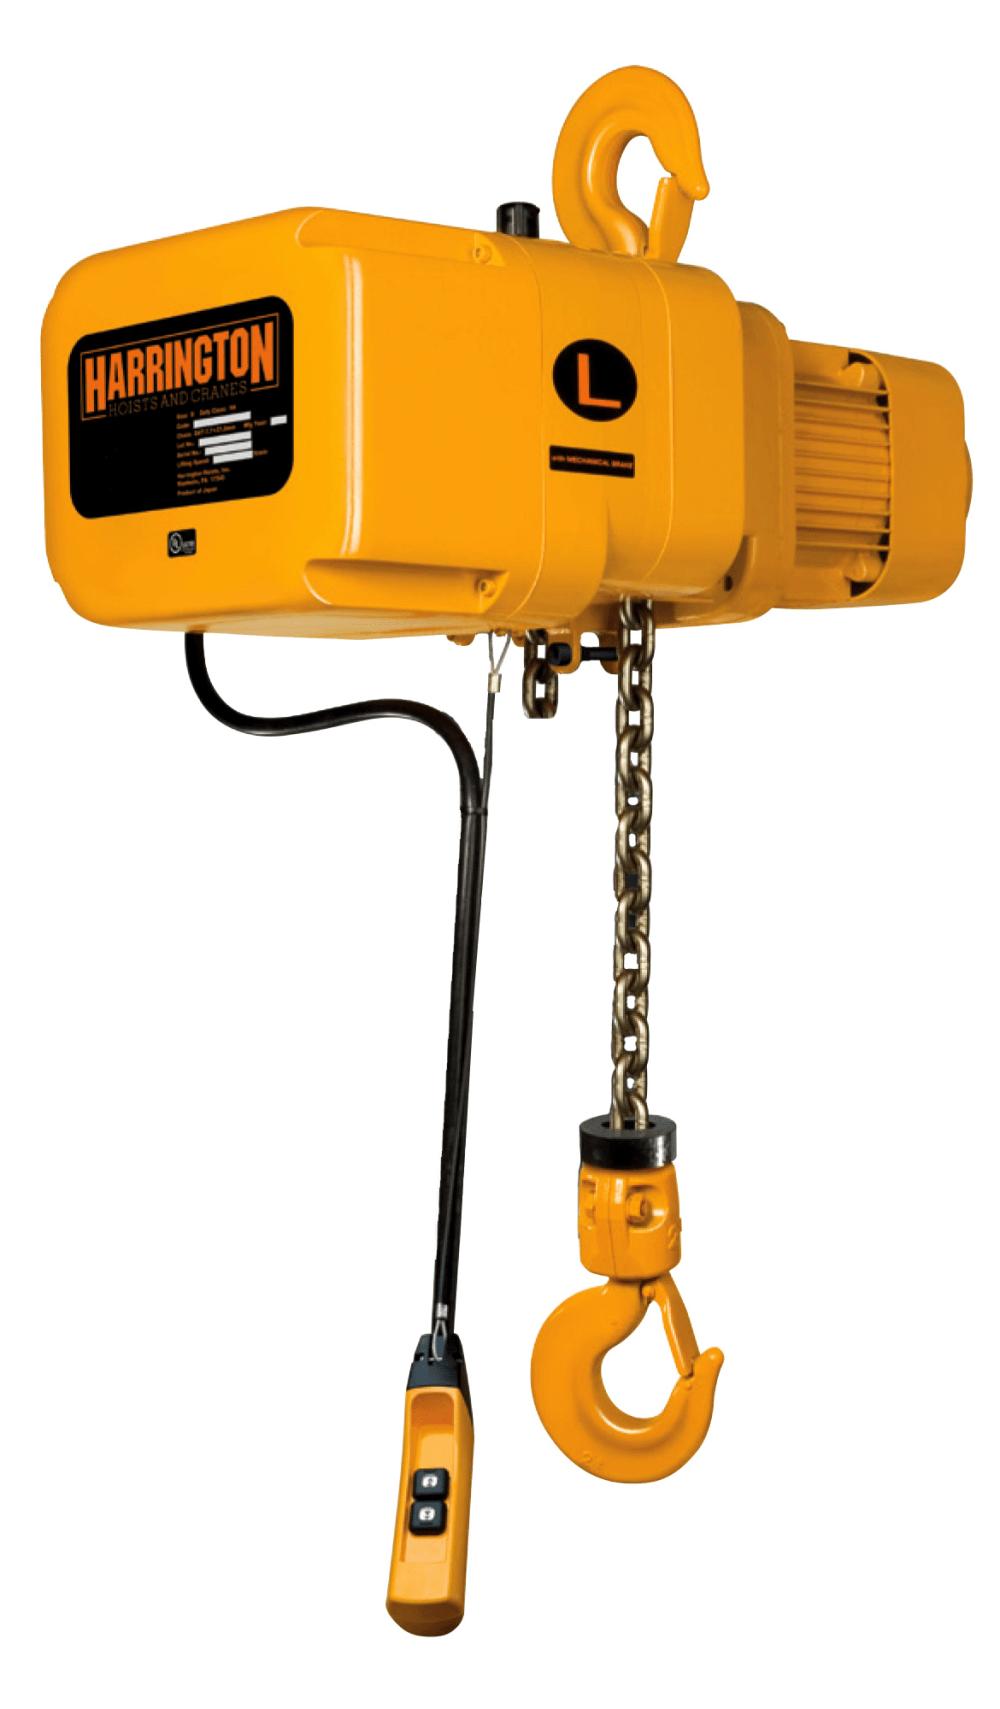 medium resolution of harrington ner electric chain hoist